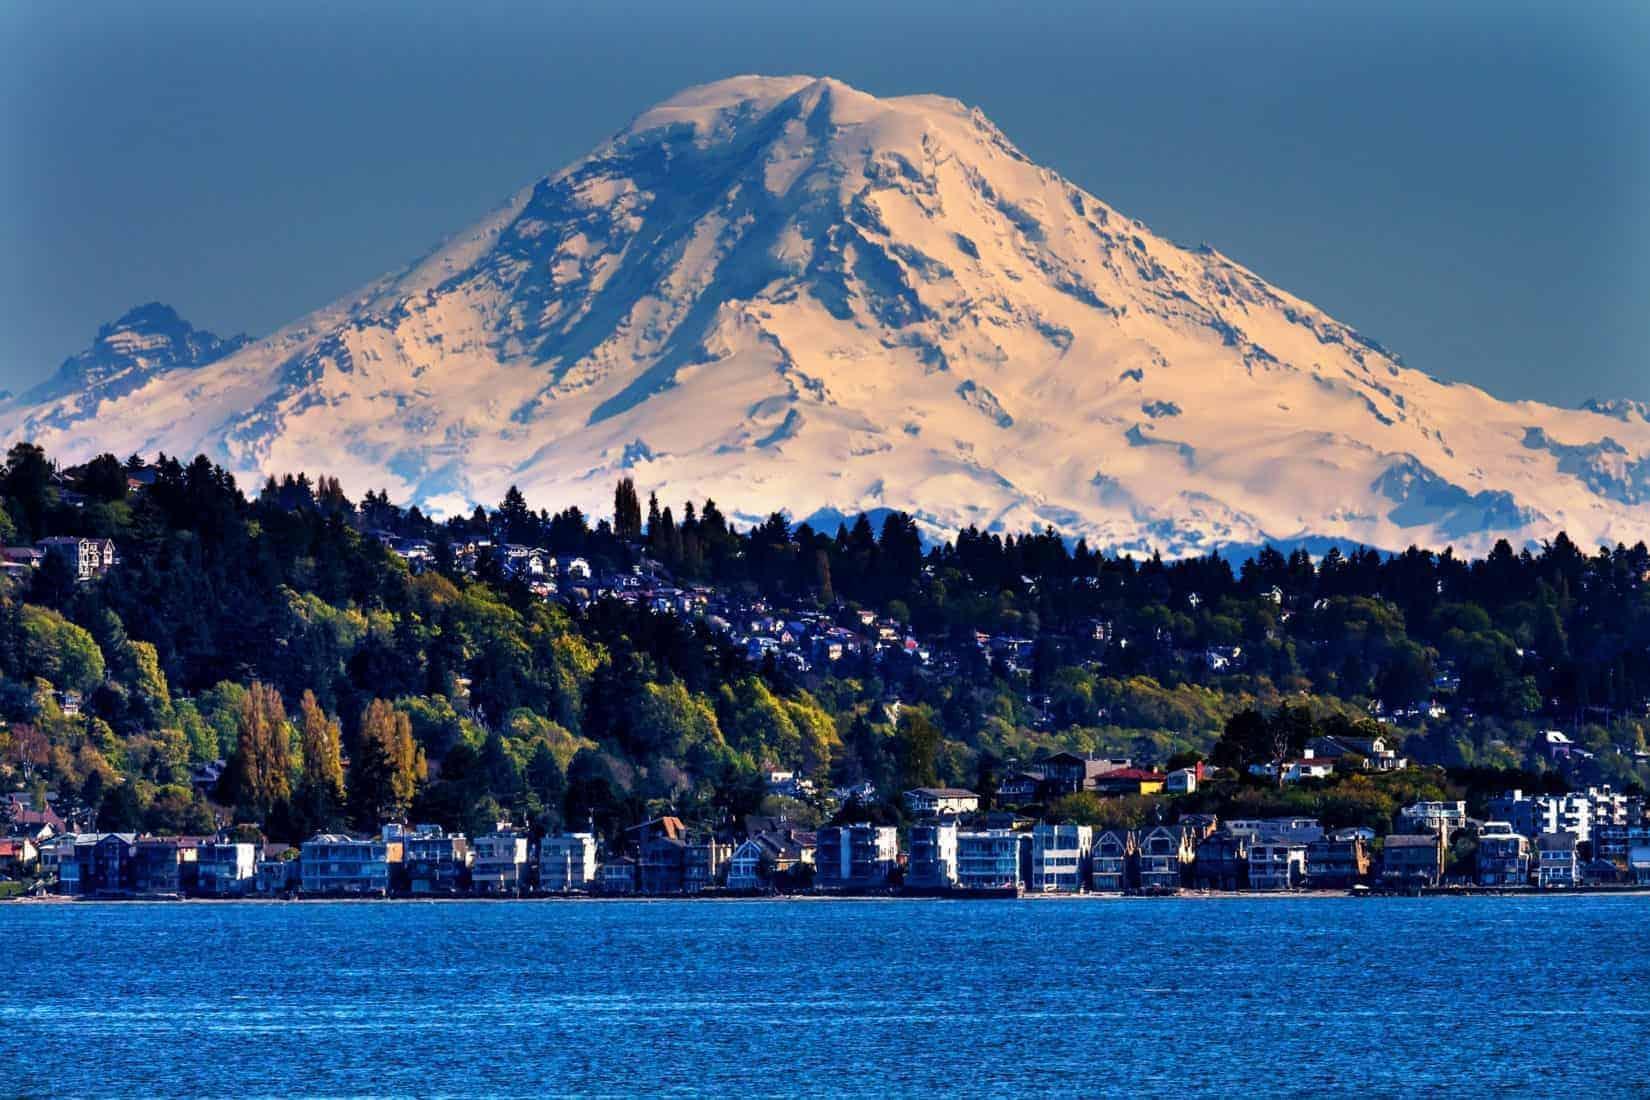 Seattle Mount Rainier and Puget Sound